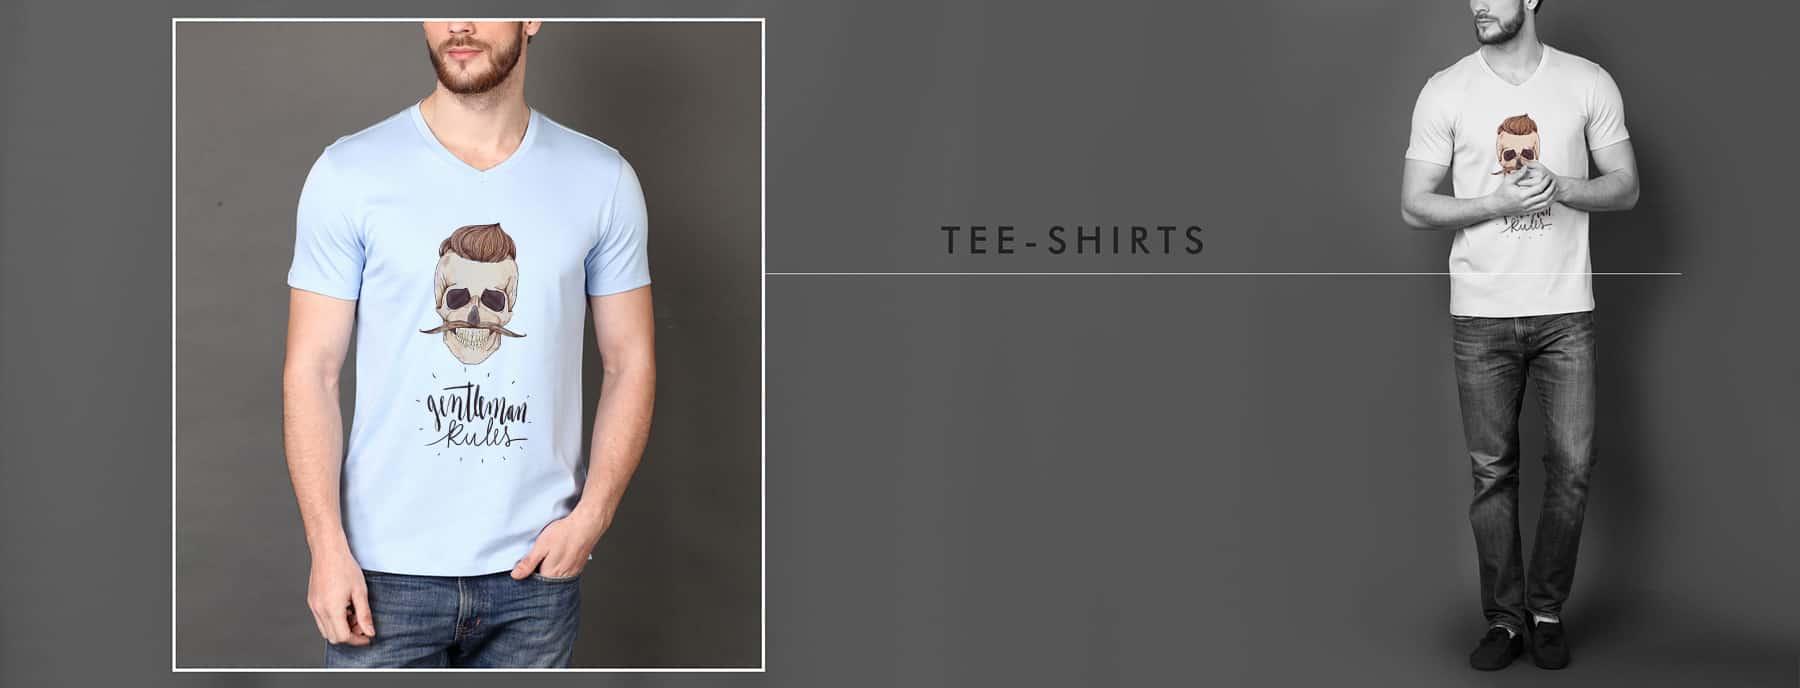 Why Do I Love T-Shirts